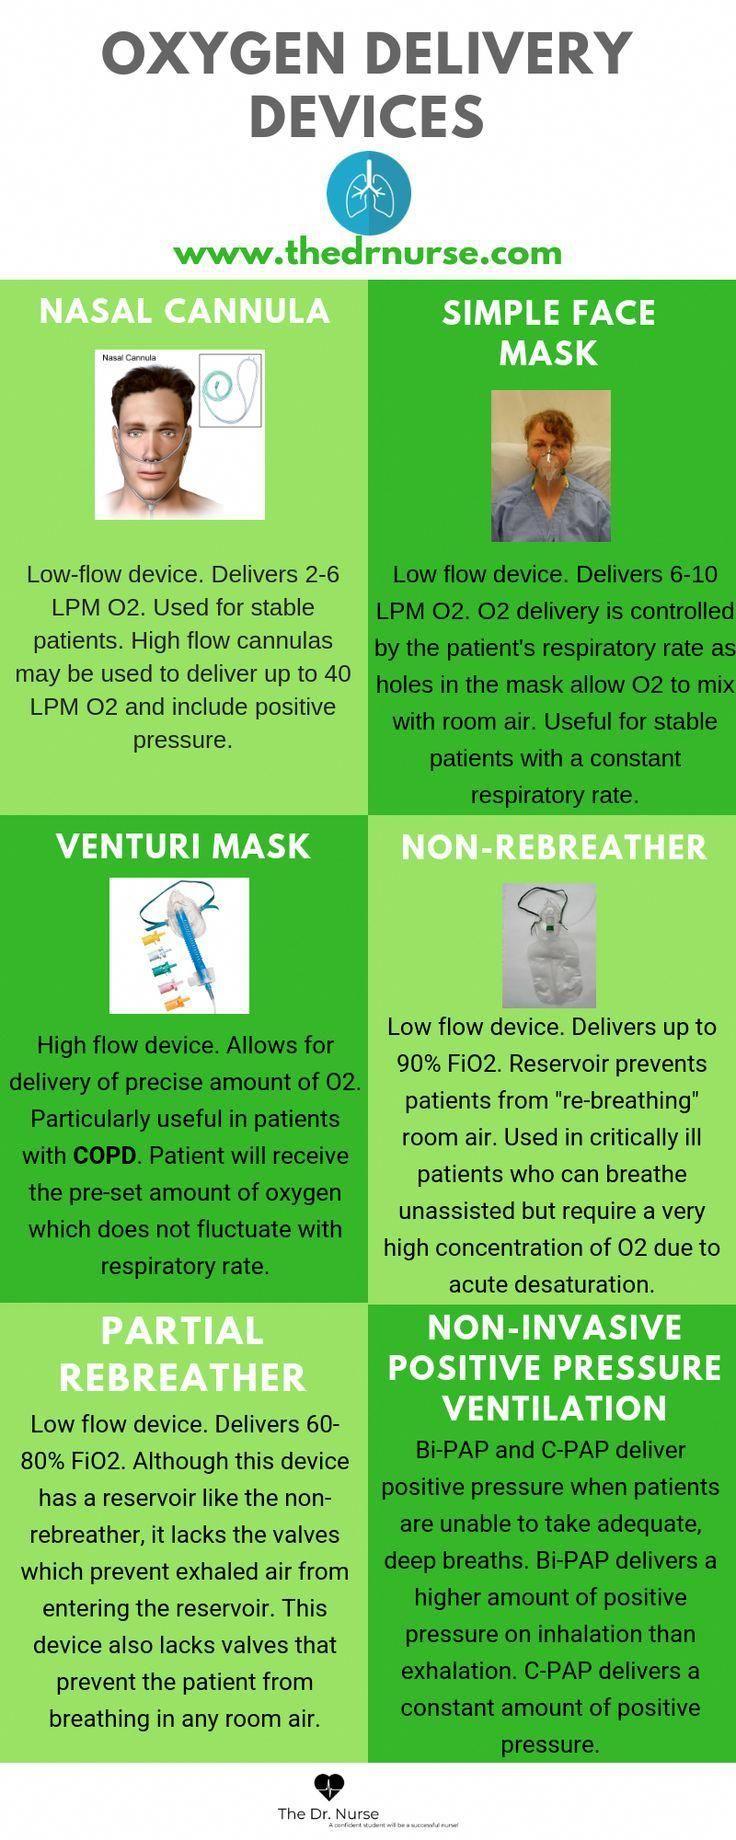 nursing nurse mask oxygen delivery devices icu rhit certification programs notes salary ventilation degree registered rn advice indication neonatal topnursingcareers